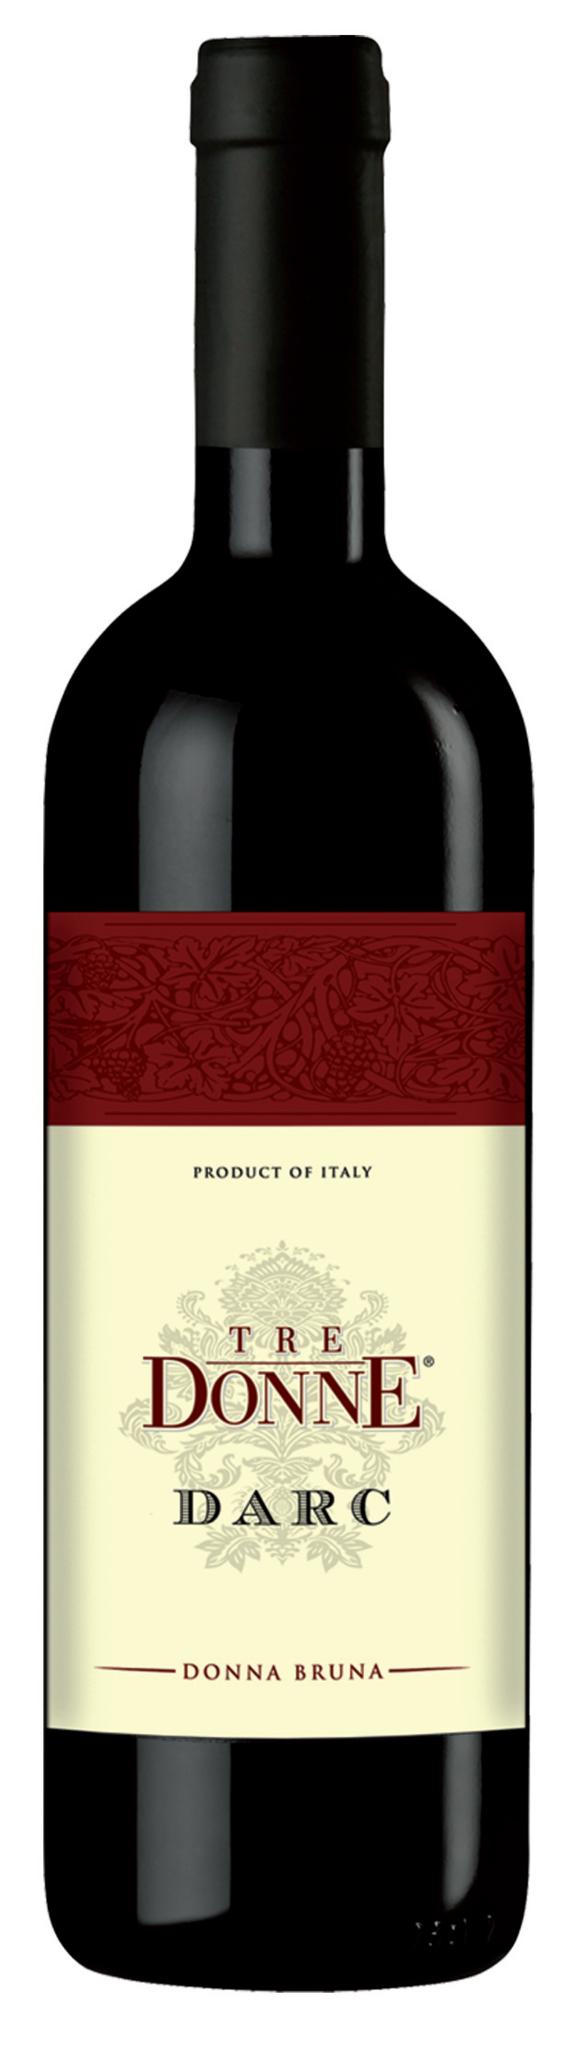 TRE DONNE DARC - Vino Rosso - Donna Bruna